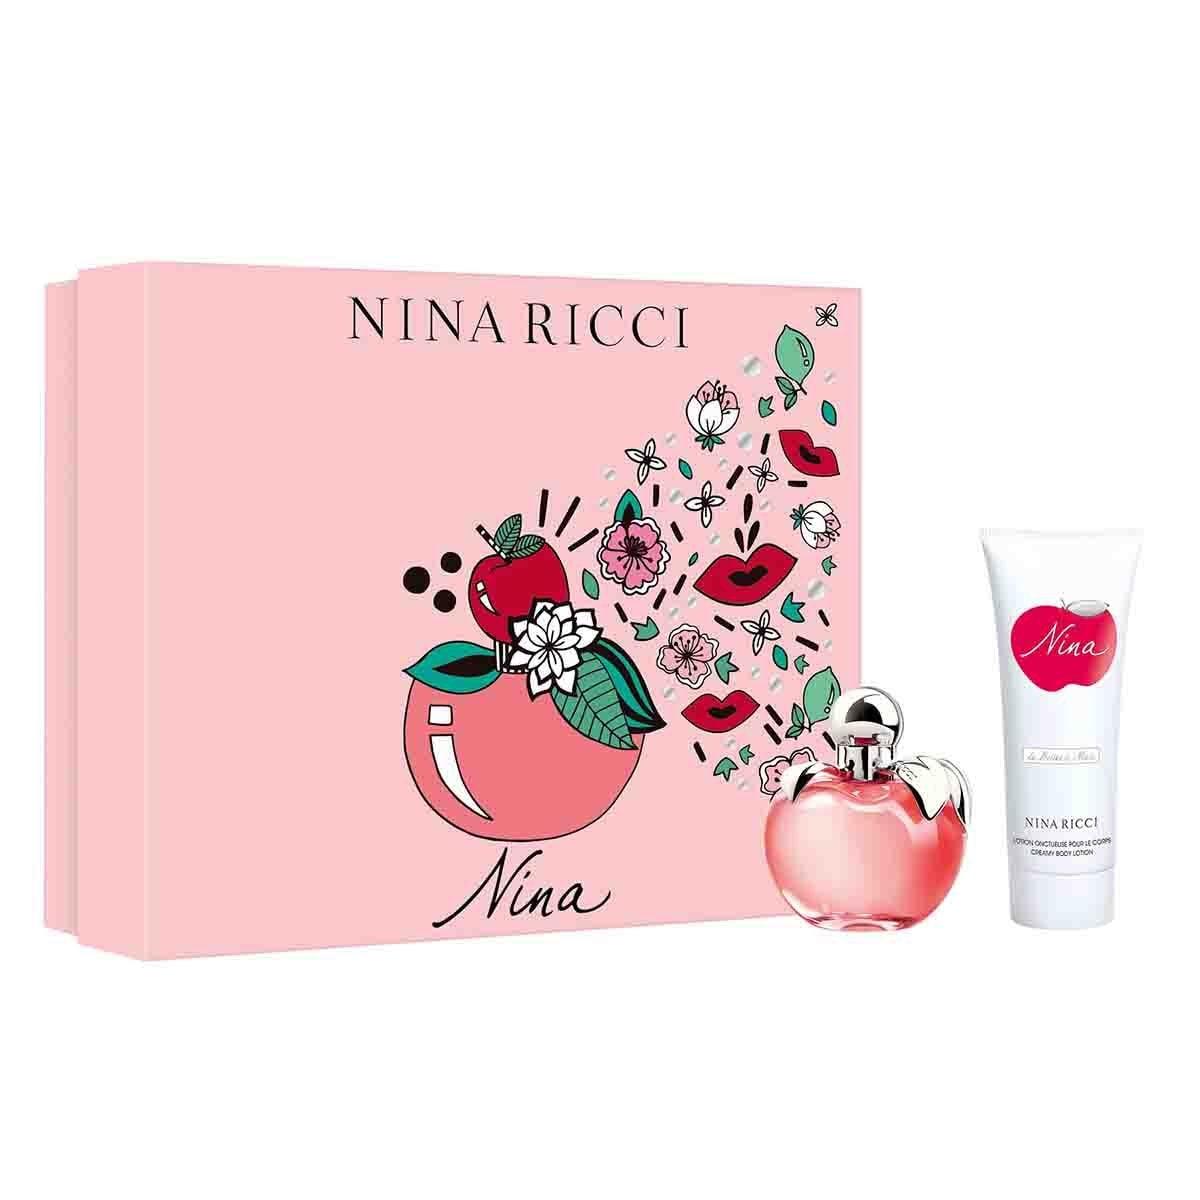 Estuche para Dama Nina Ricci Nina Edt 80 Ml + Body Lotion 100 Ml